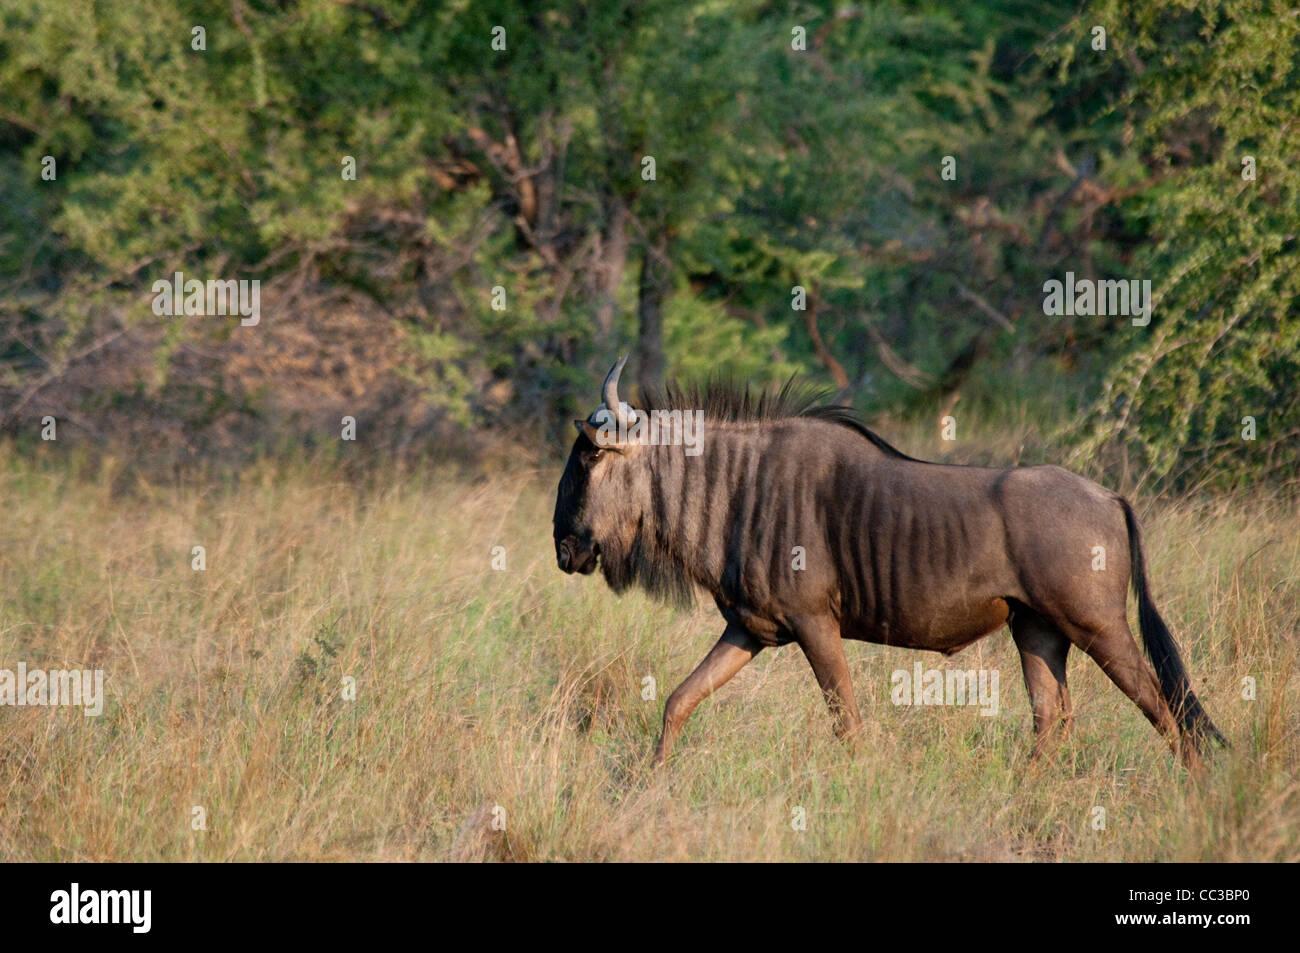 Africa Botswana Tuba Tree-Blue Wildebeest walking (Connochaetes taurinus) - Stock Image